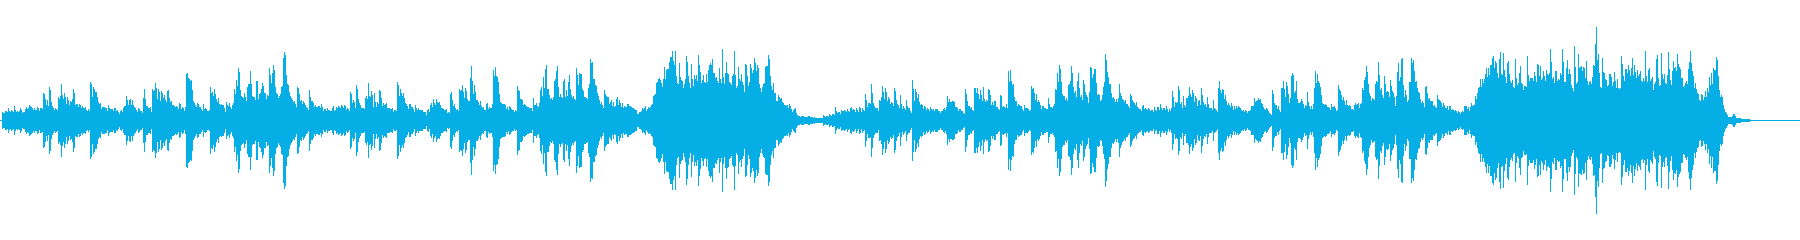 RAINY DAYS/レイニー・デイズの再生済みの波形